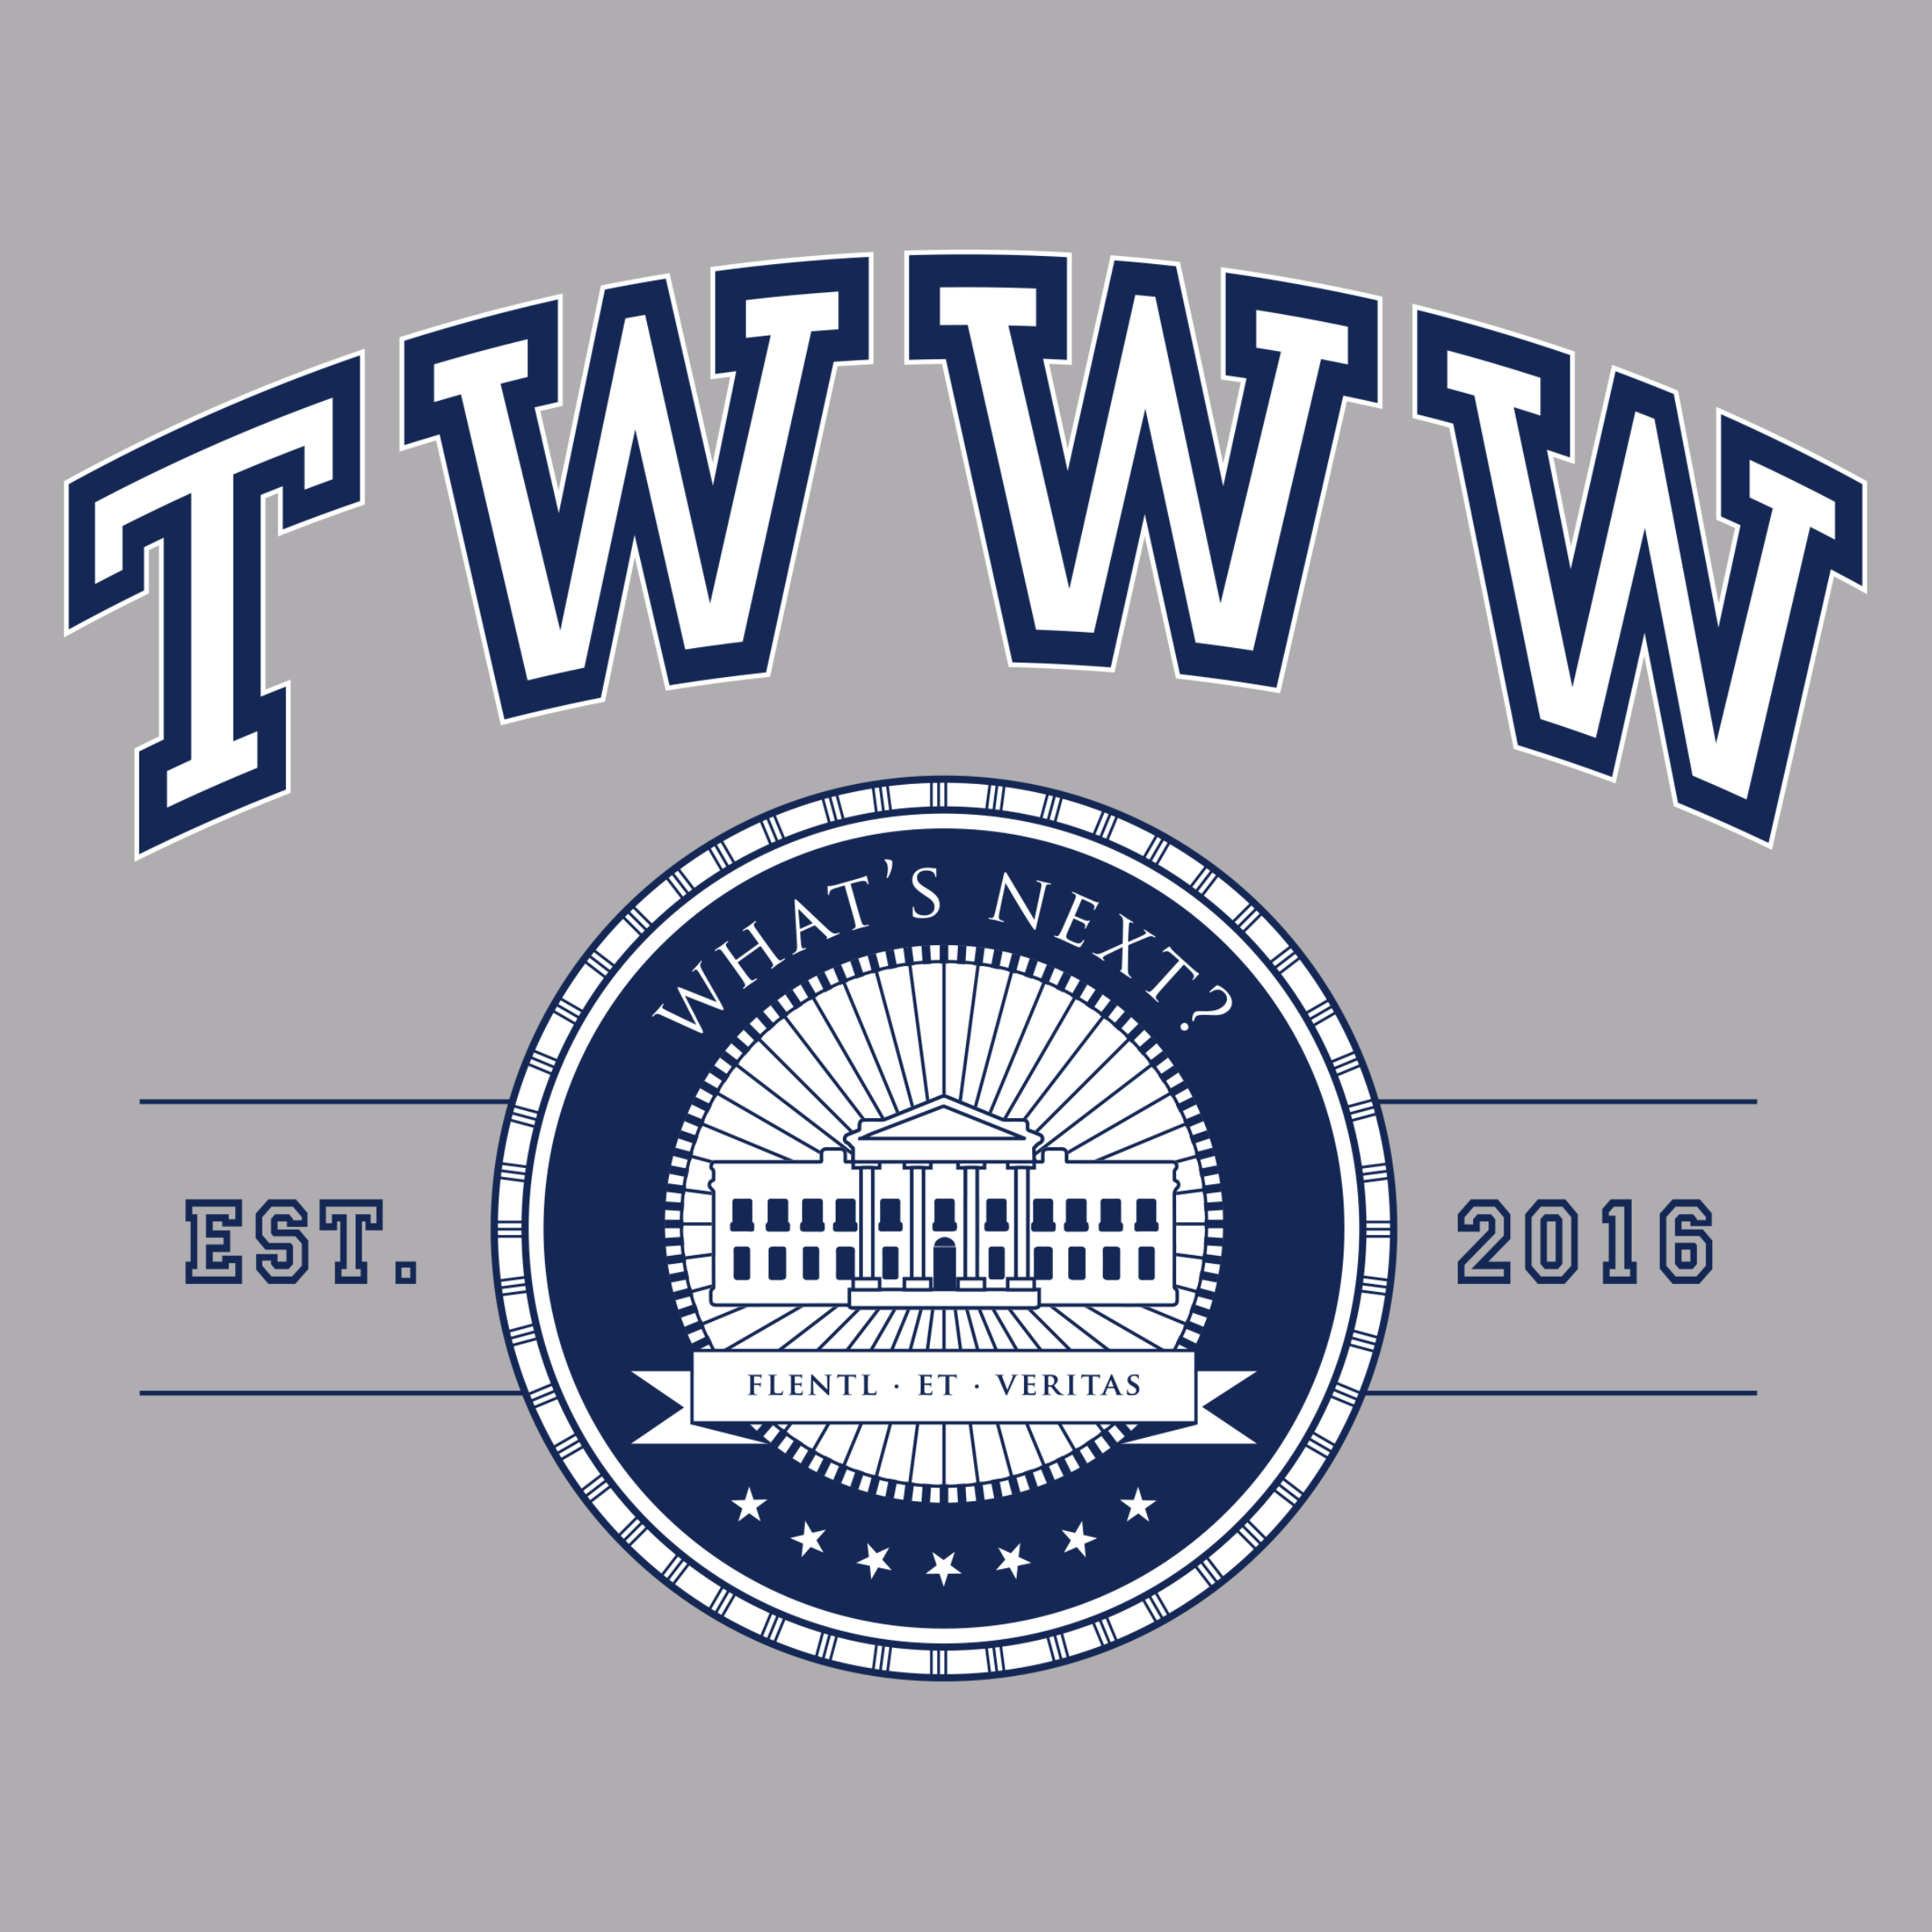 TWWW University Detail